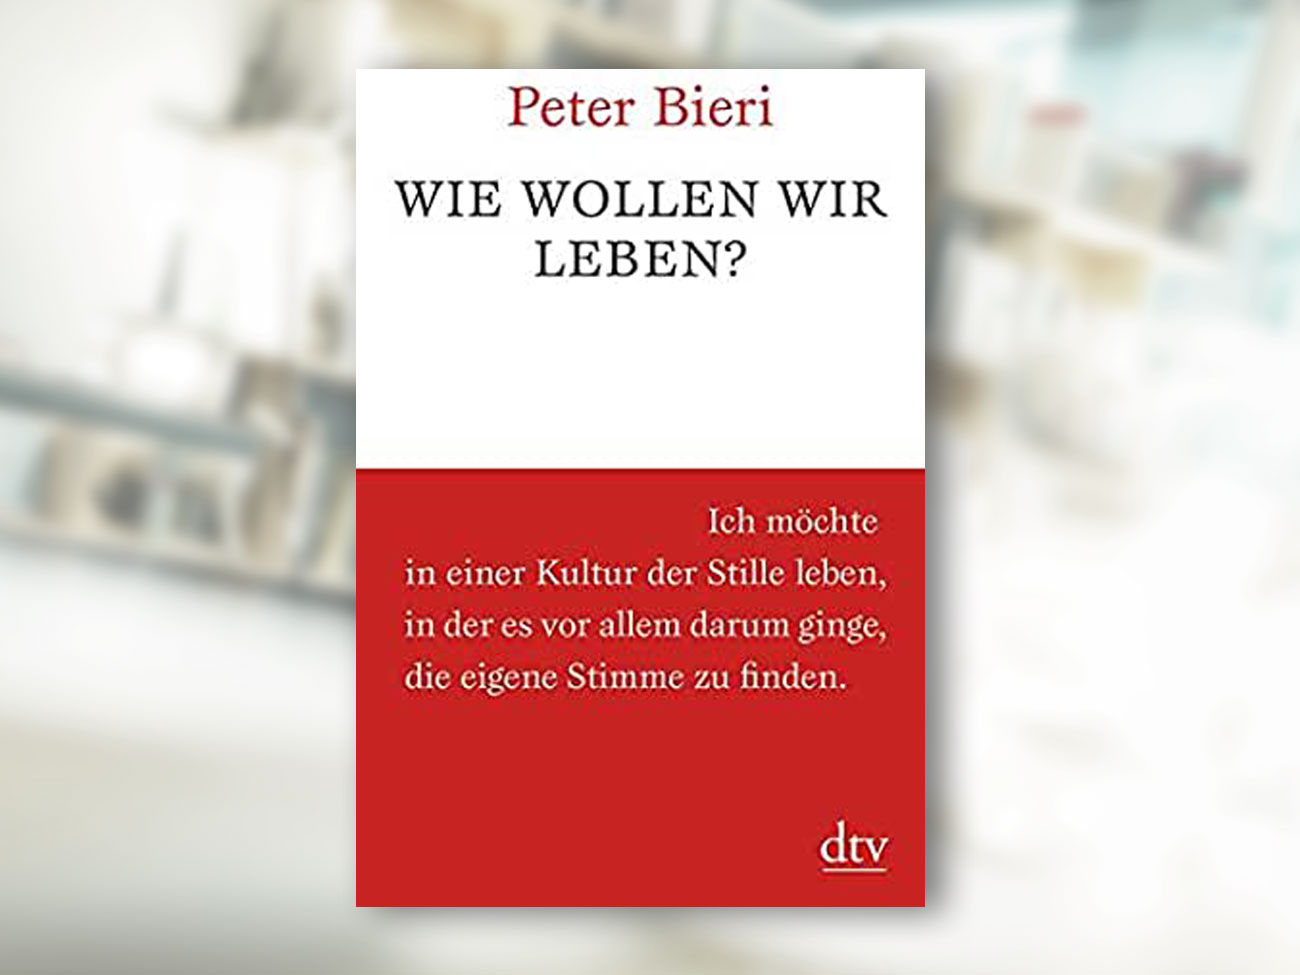 Peter Bieri, Wie wollen wir leben?